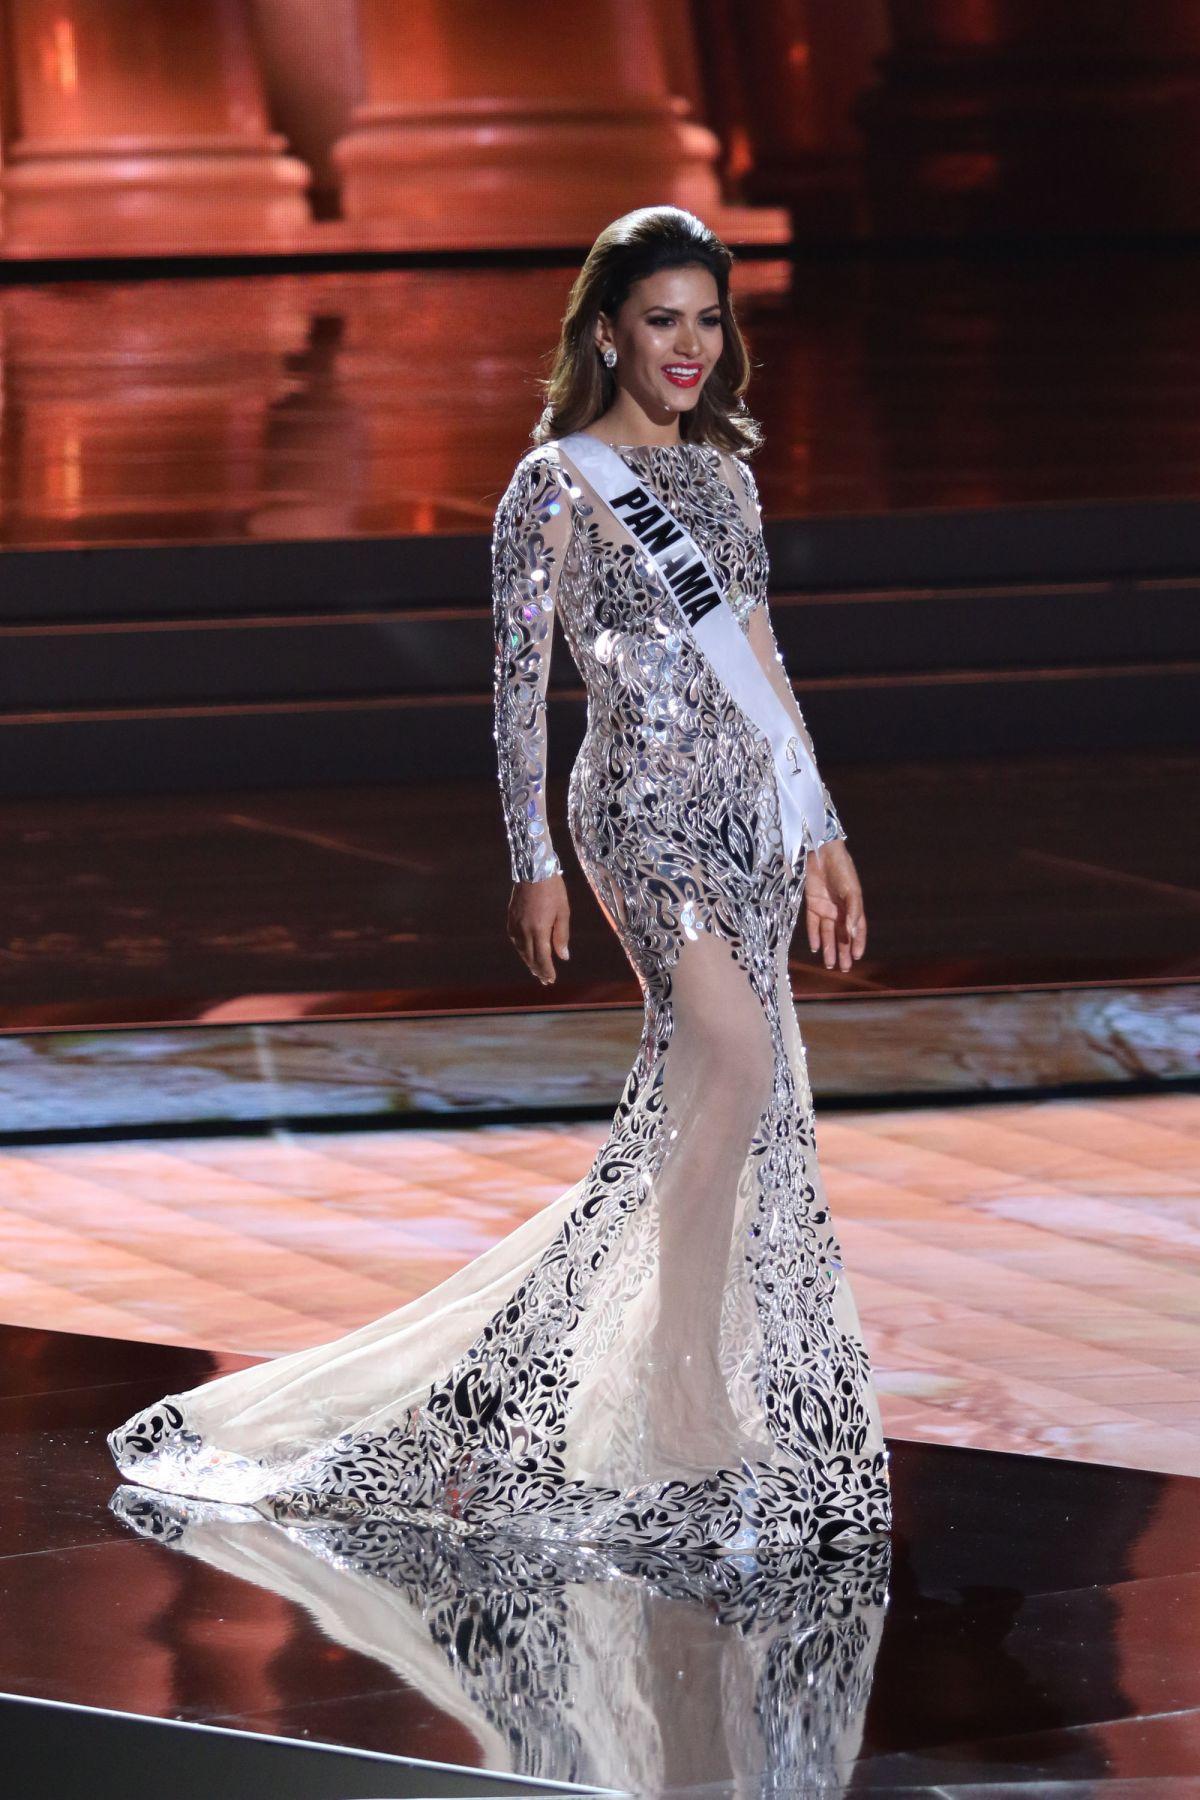 GLADYS BRANDAO AMAYA - Miss Universe 2015 Preliminary Round 12/16/2015